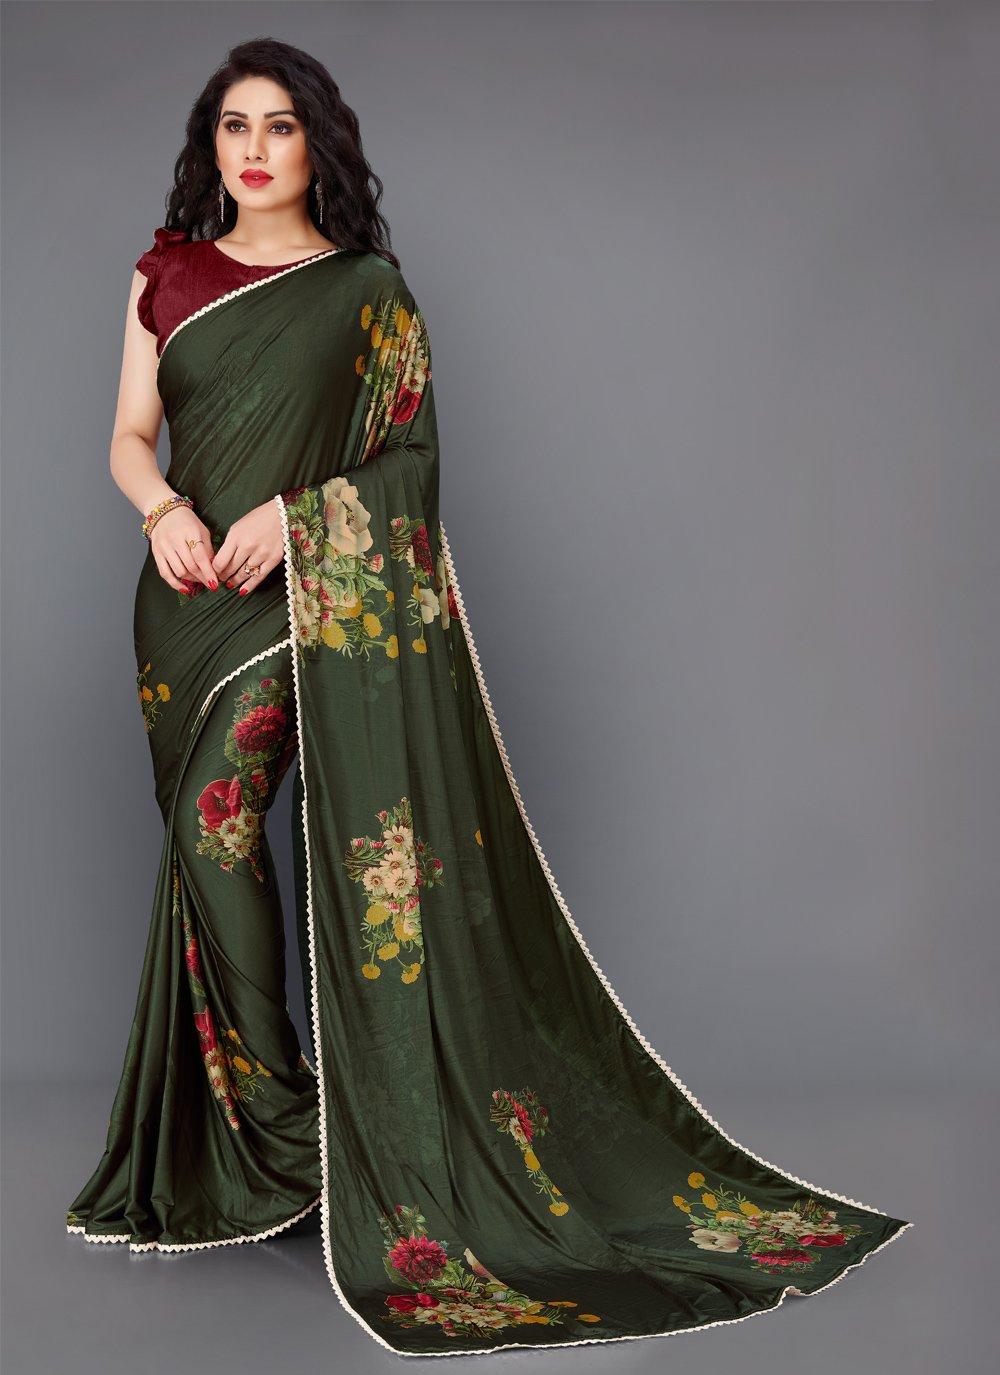 Floral Print Green Contemporary Saree